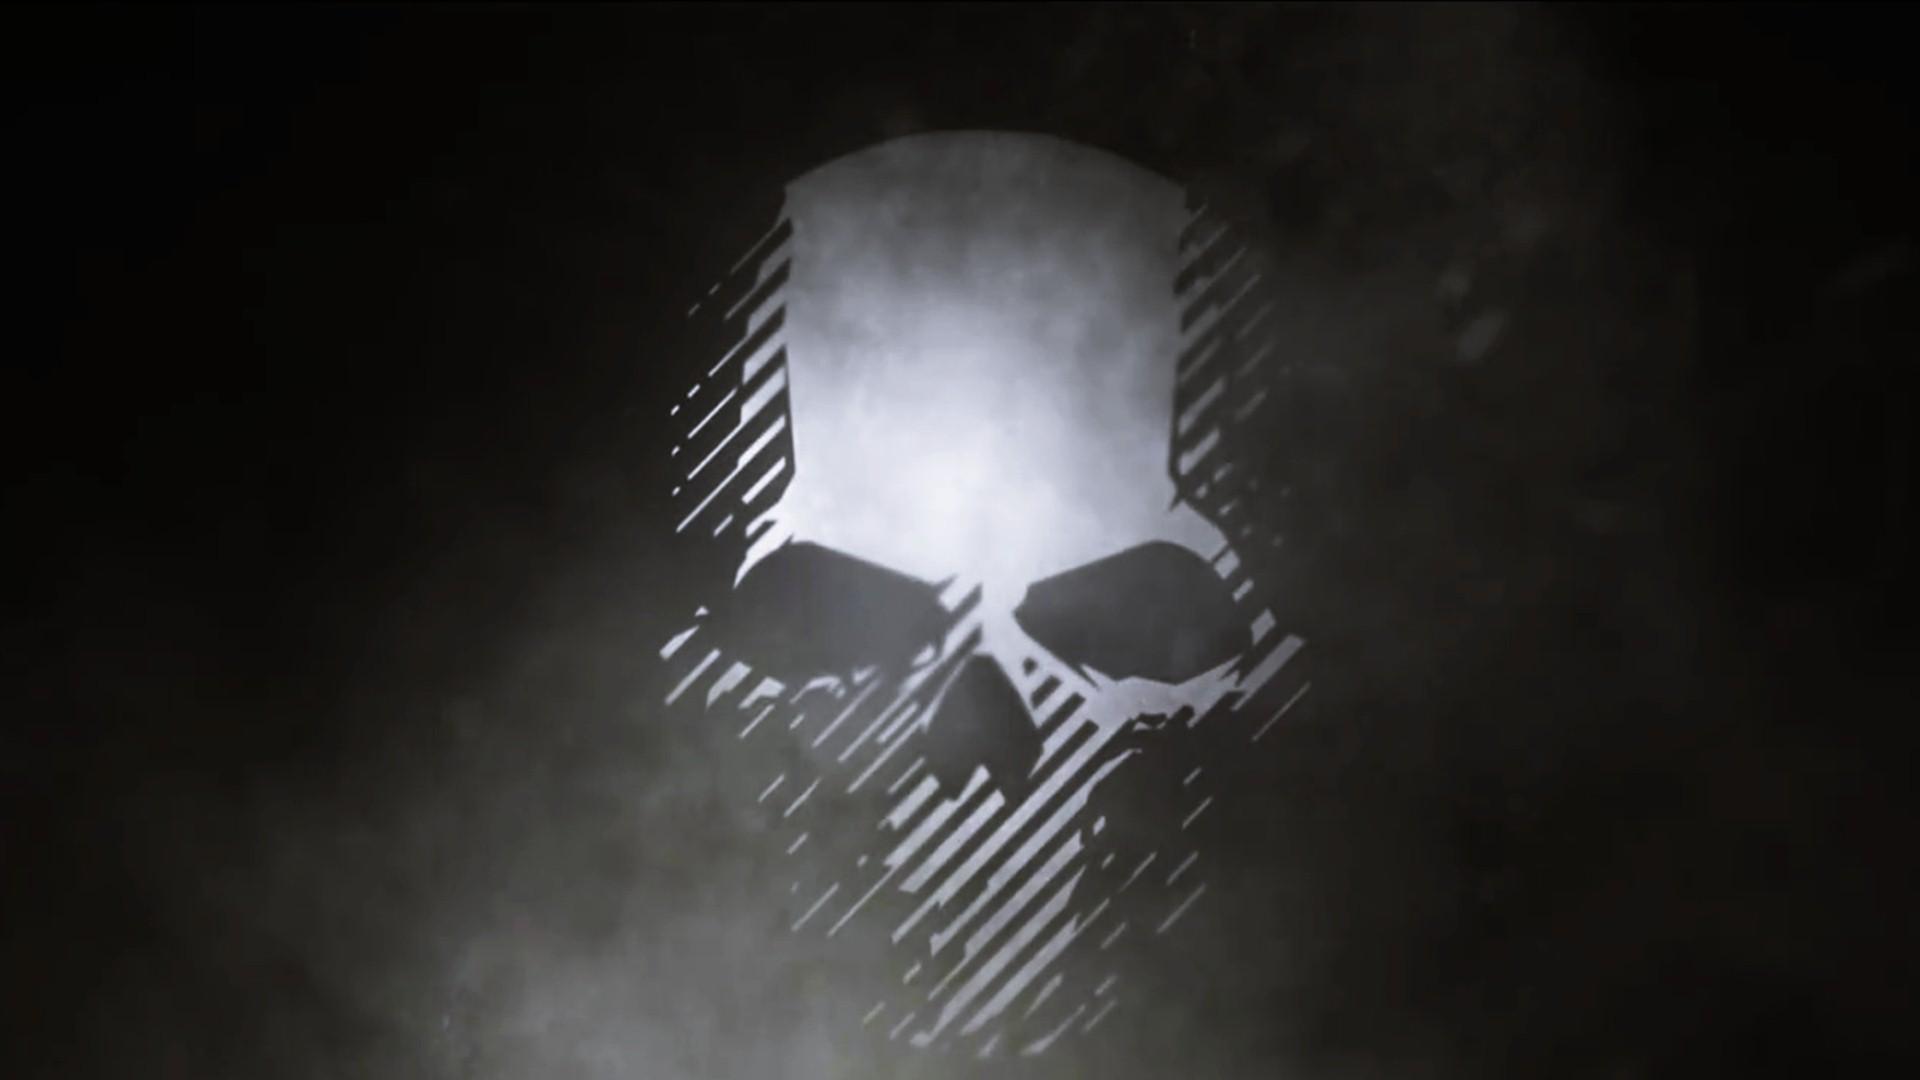 Ghost Recon Wildlands Wallpaper 1920x1080: Ghost Recon Future Soldier Wallpaper (87+ Images